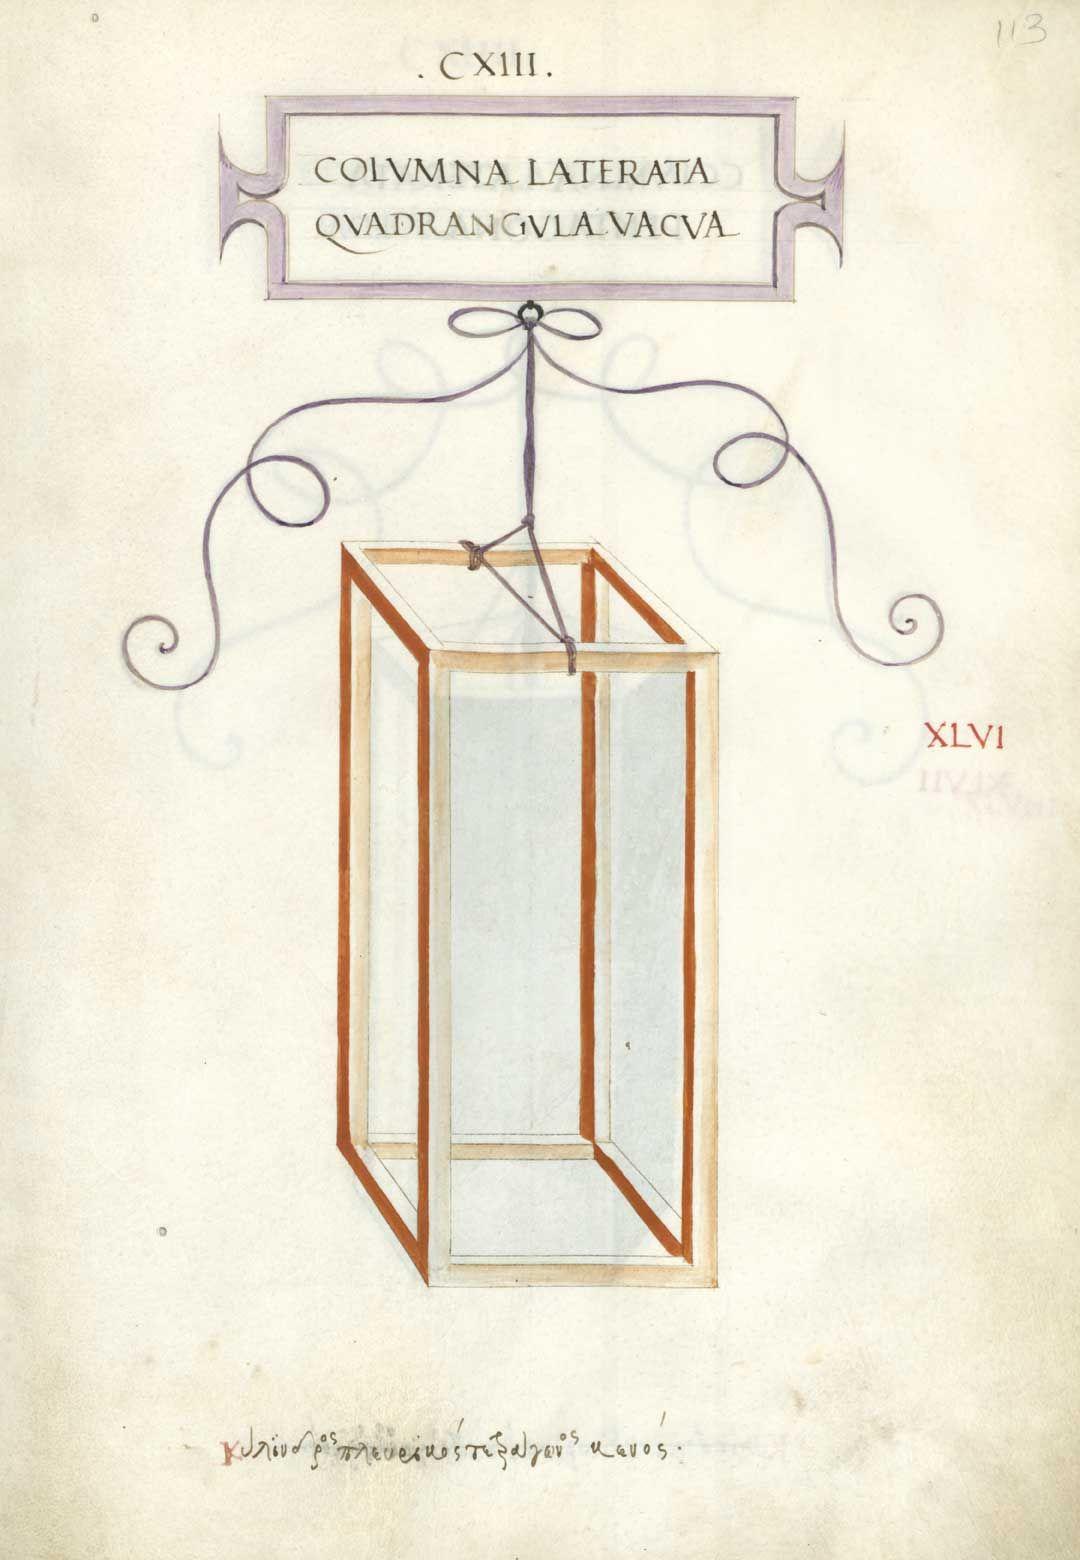 Colvmna Laterata Qvadrangvla Vacva Cxiii Leonardo Da Vinci Sezione Aurea Scienza